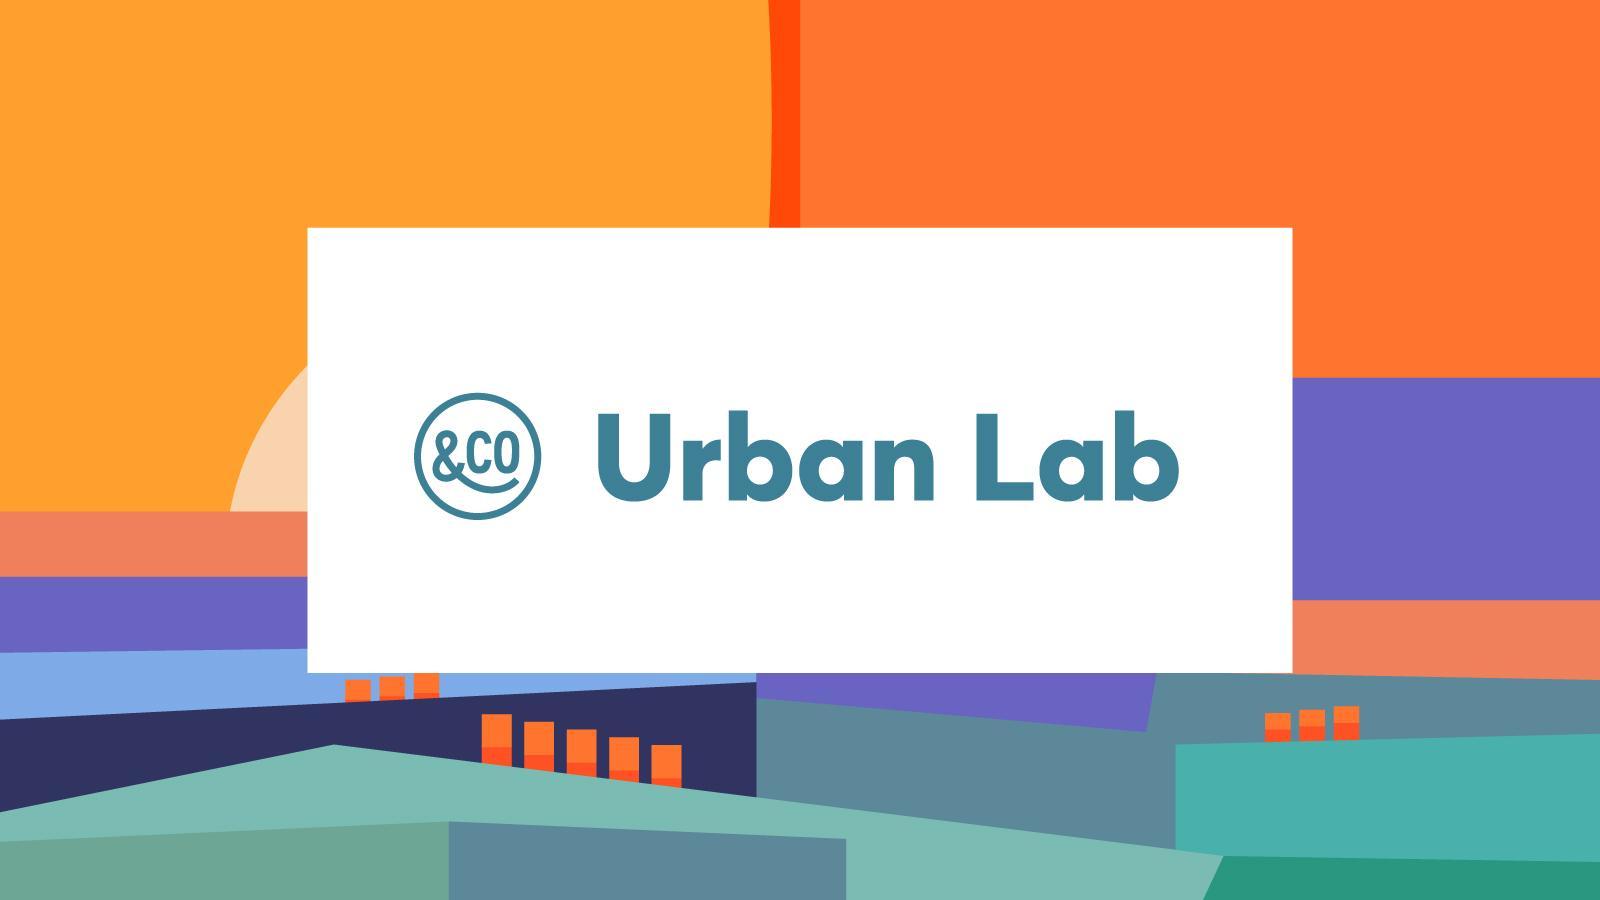 logo Urban Lab